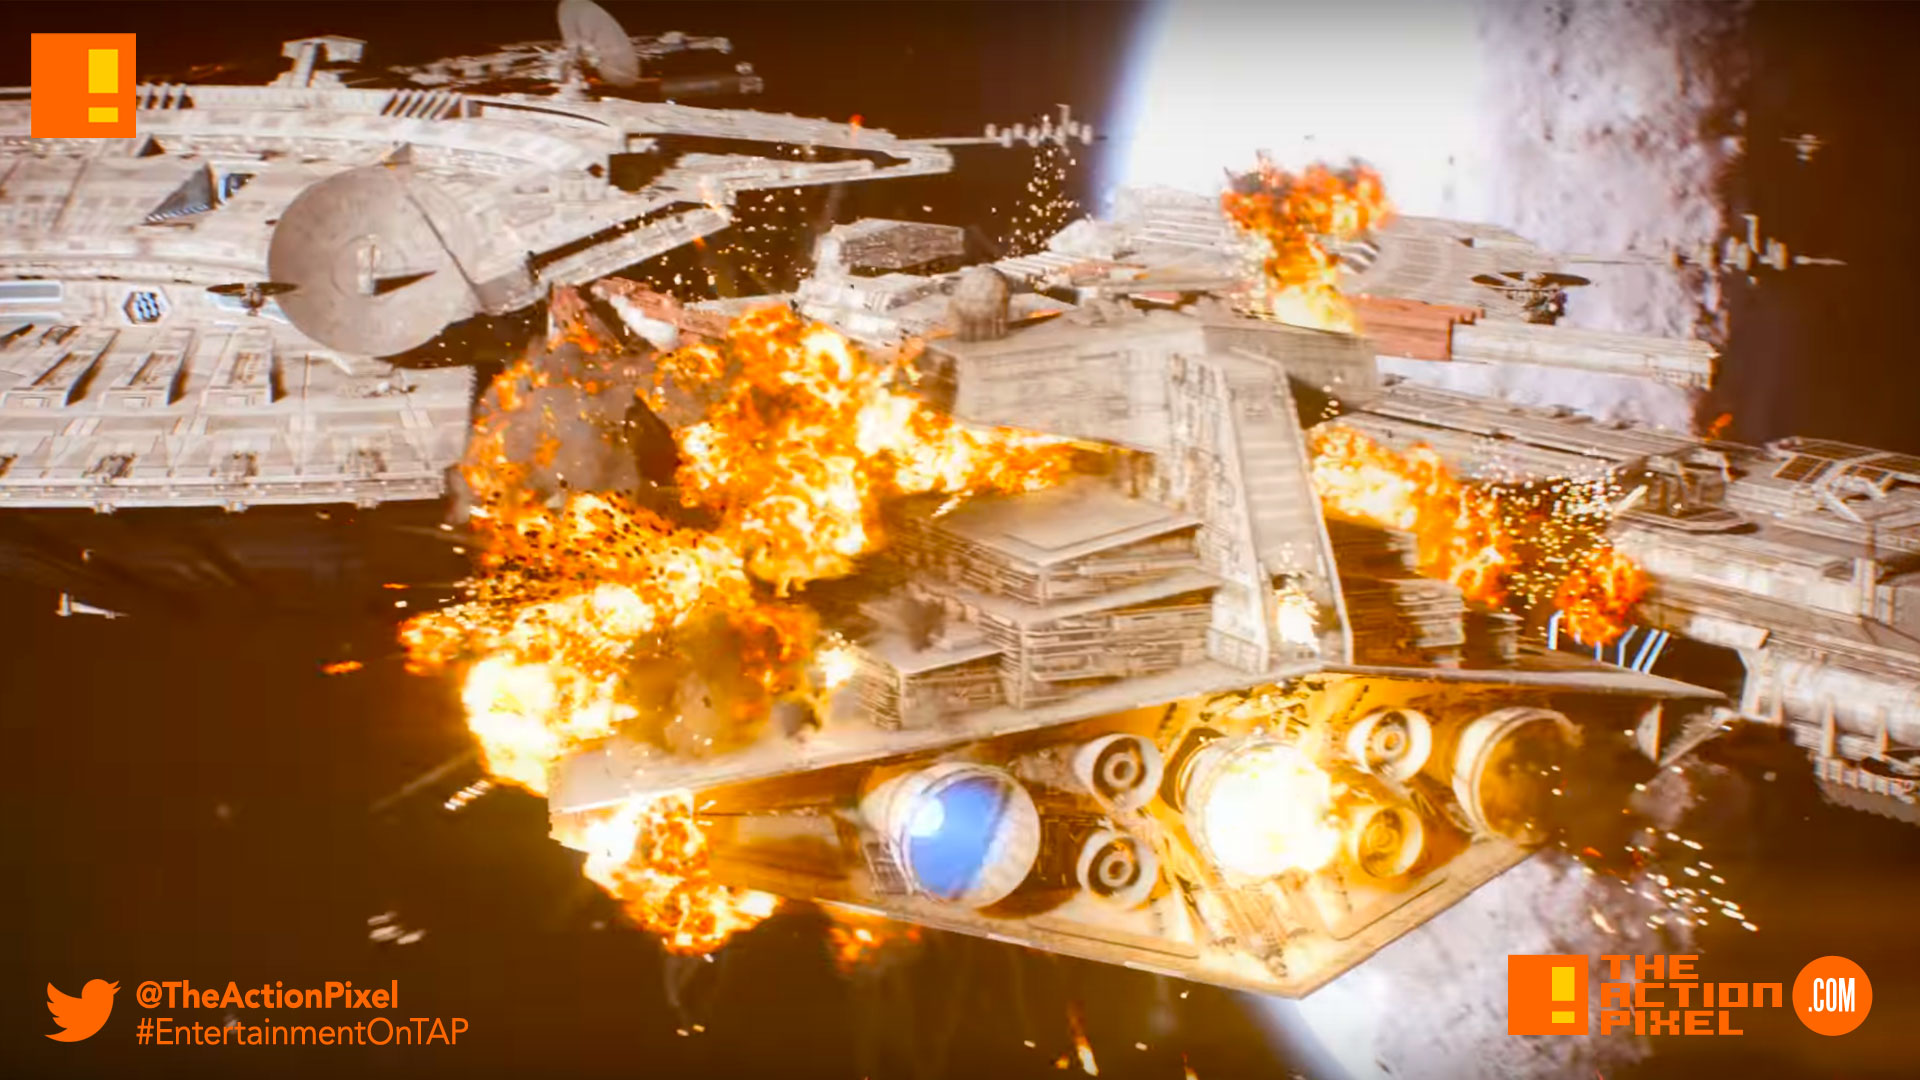 star wars: Battlefront II, Starfighter Assault, the action pixel, entertainment on tap,